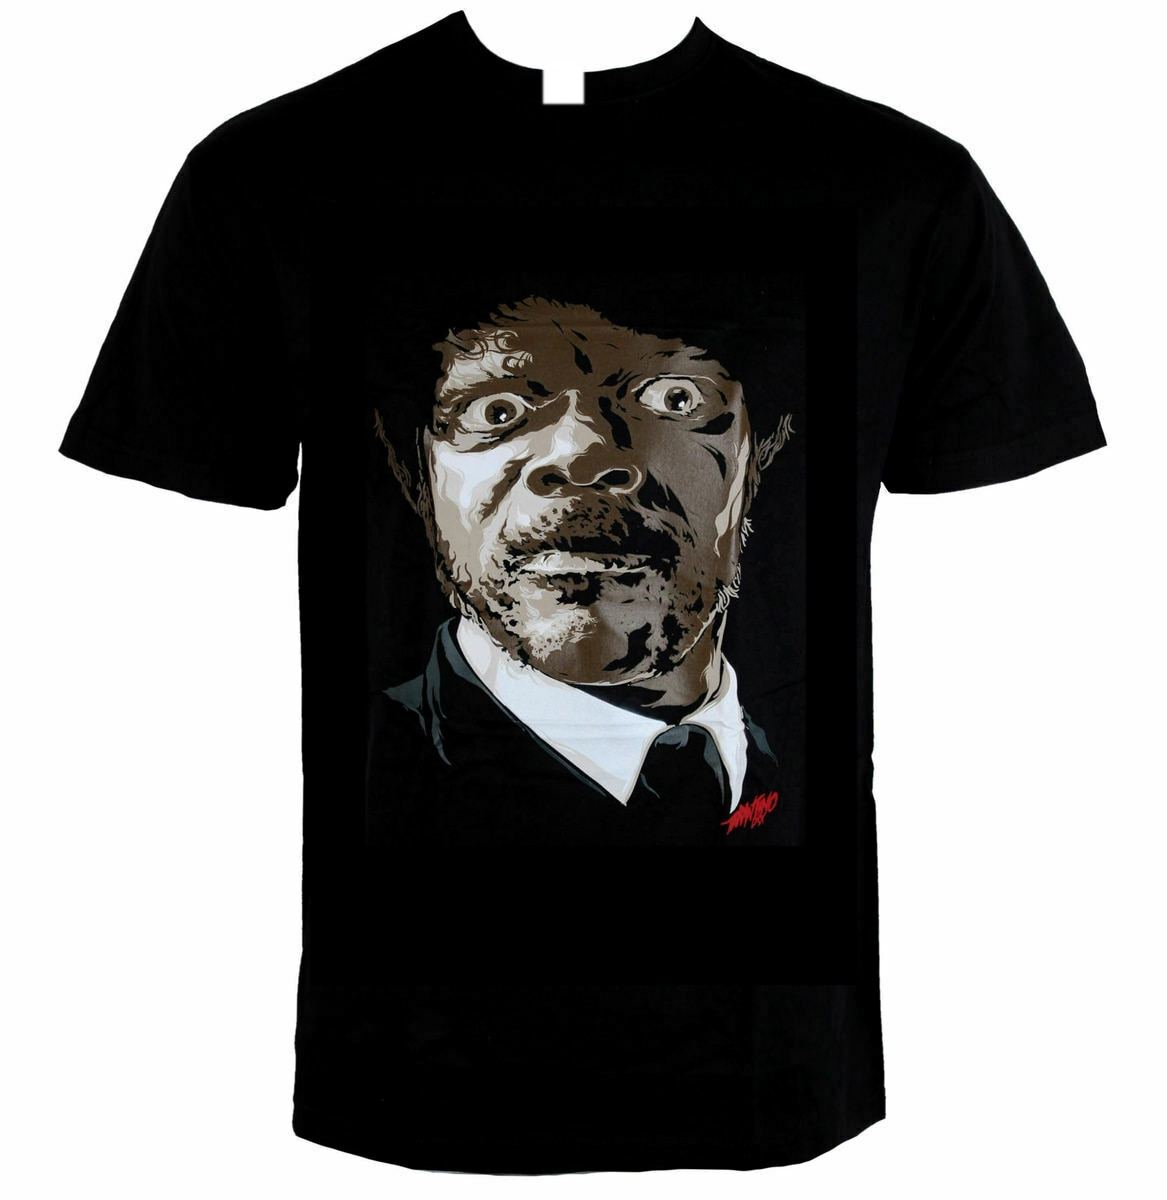 herren-t-shirt-quentin-tarantino-kill-bill-jules-top-tee-100-cotton-humor-men-crewneck-tee-shirts-for-male-boy-t-shirt